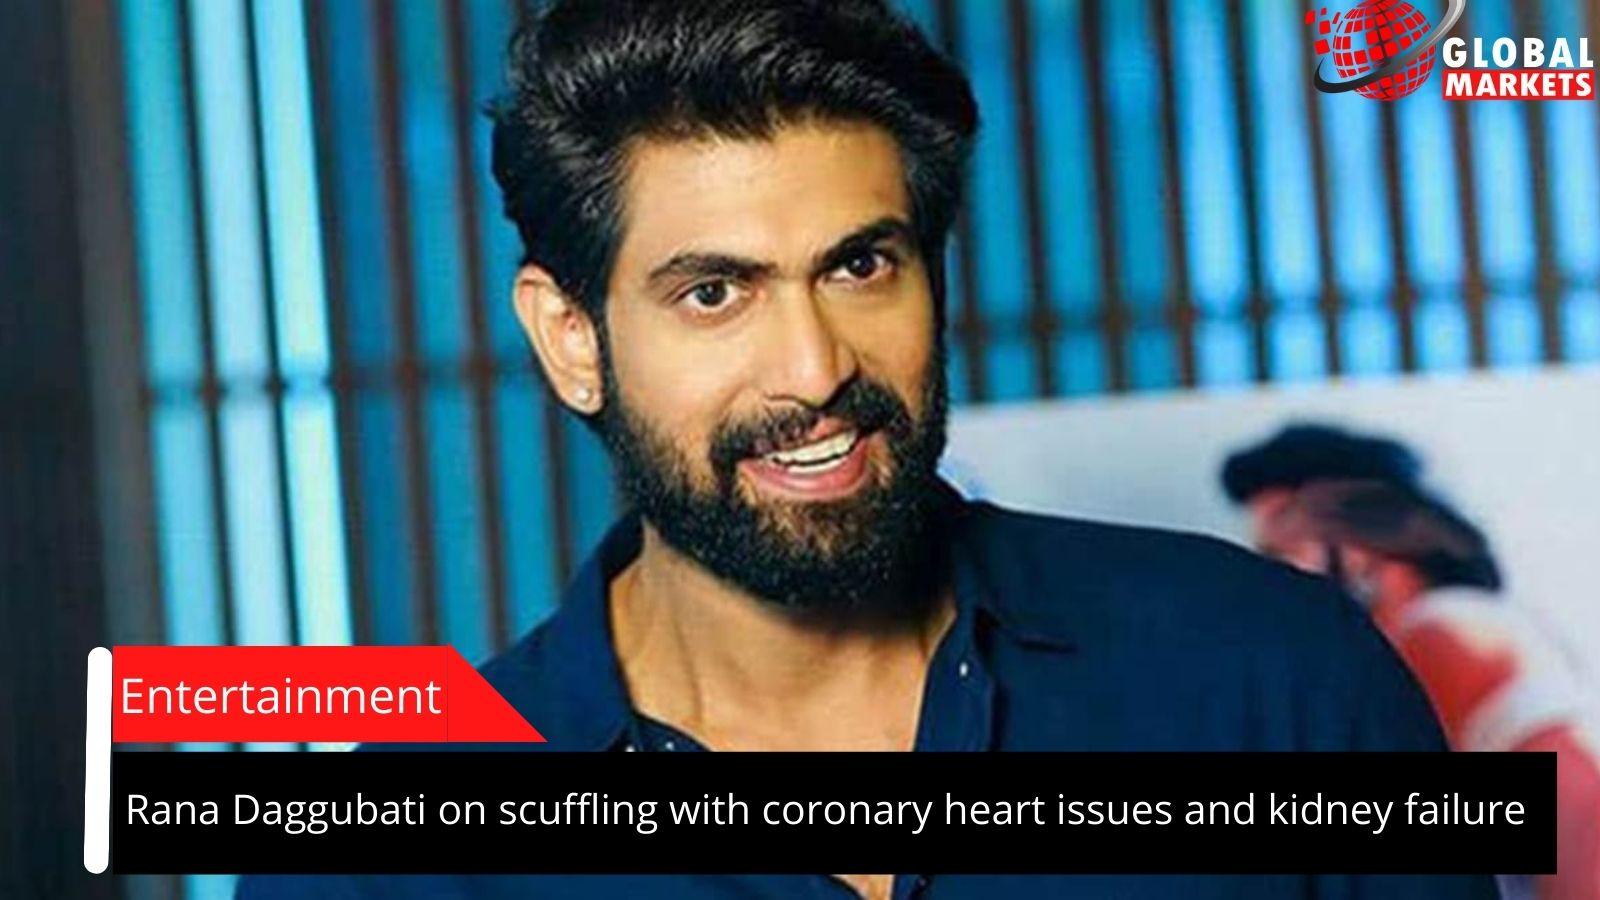 Rana Daggubati on scuffling with coronary heart issues and kidney failure